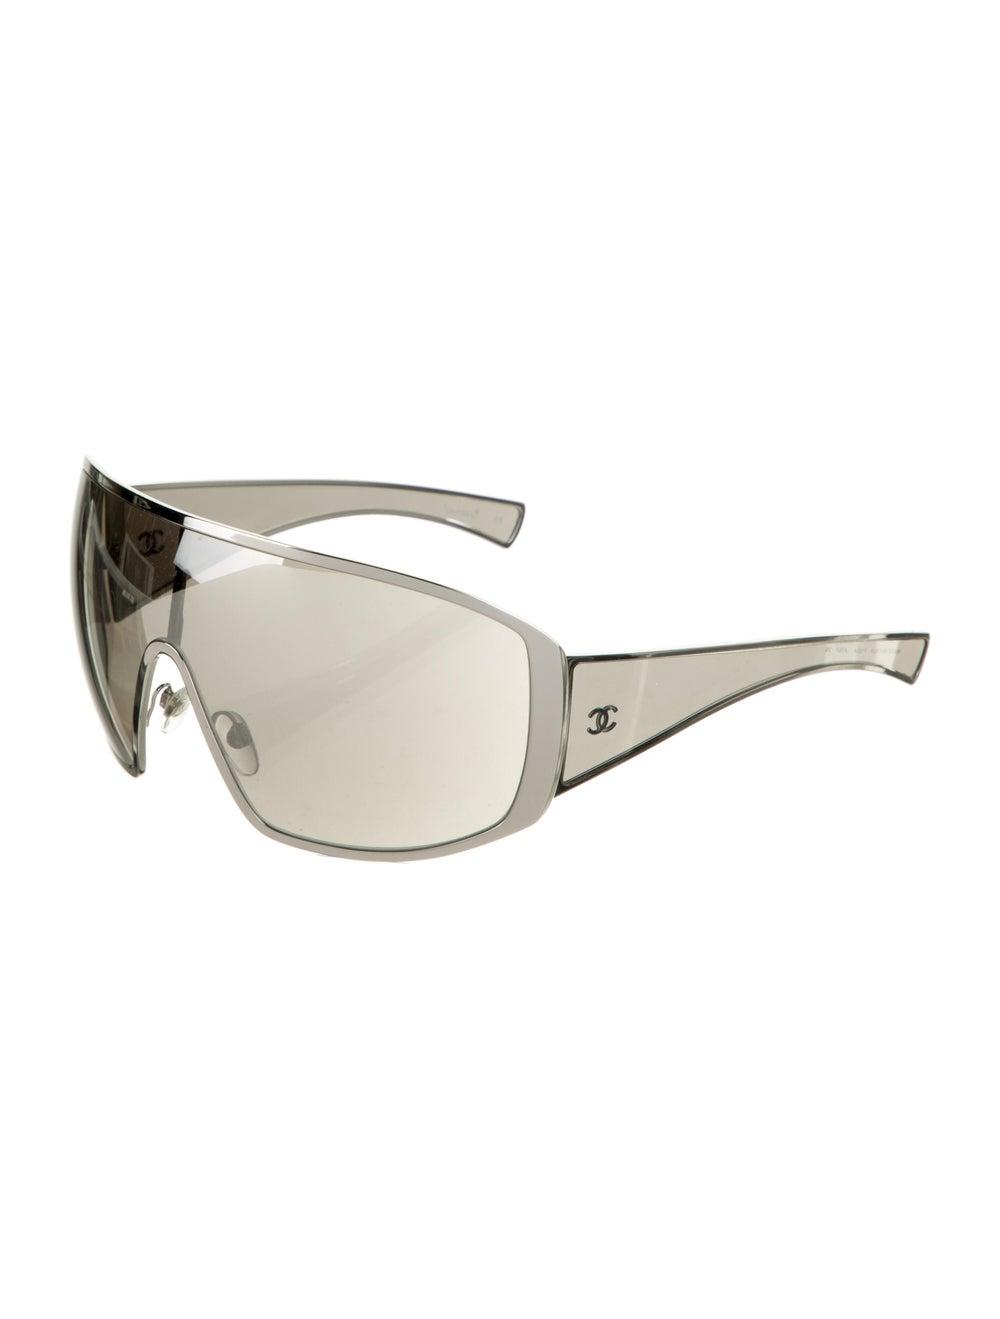 Chanel Runway Shield Sunglasses Silver - image 2